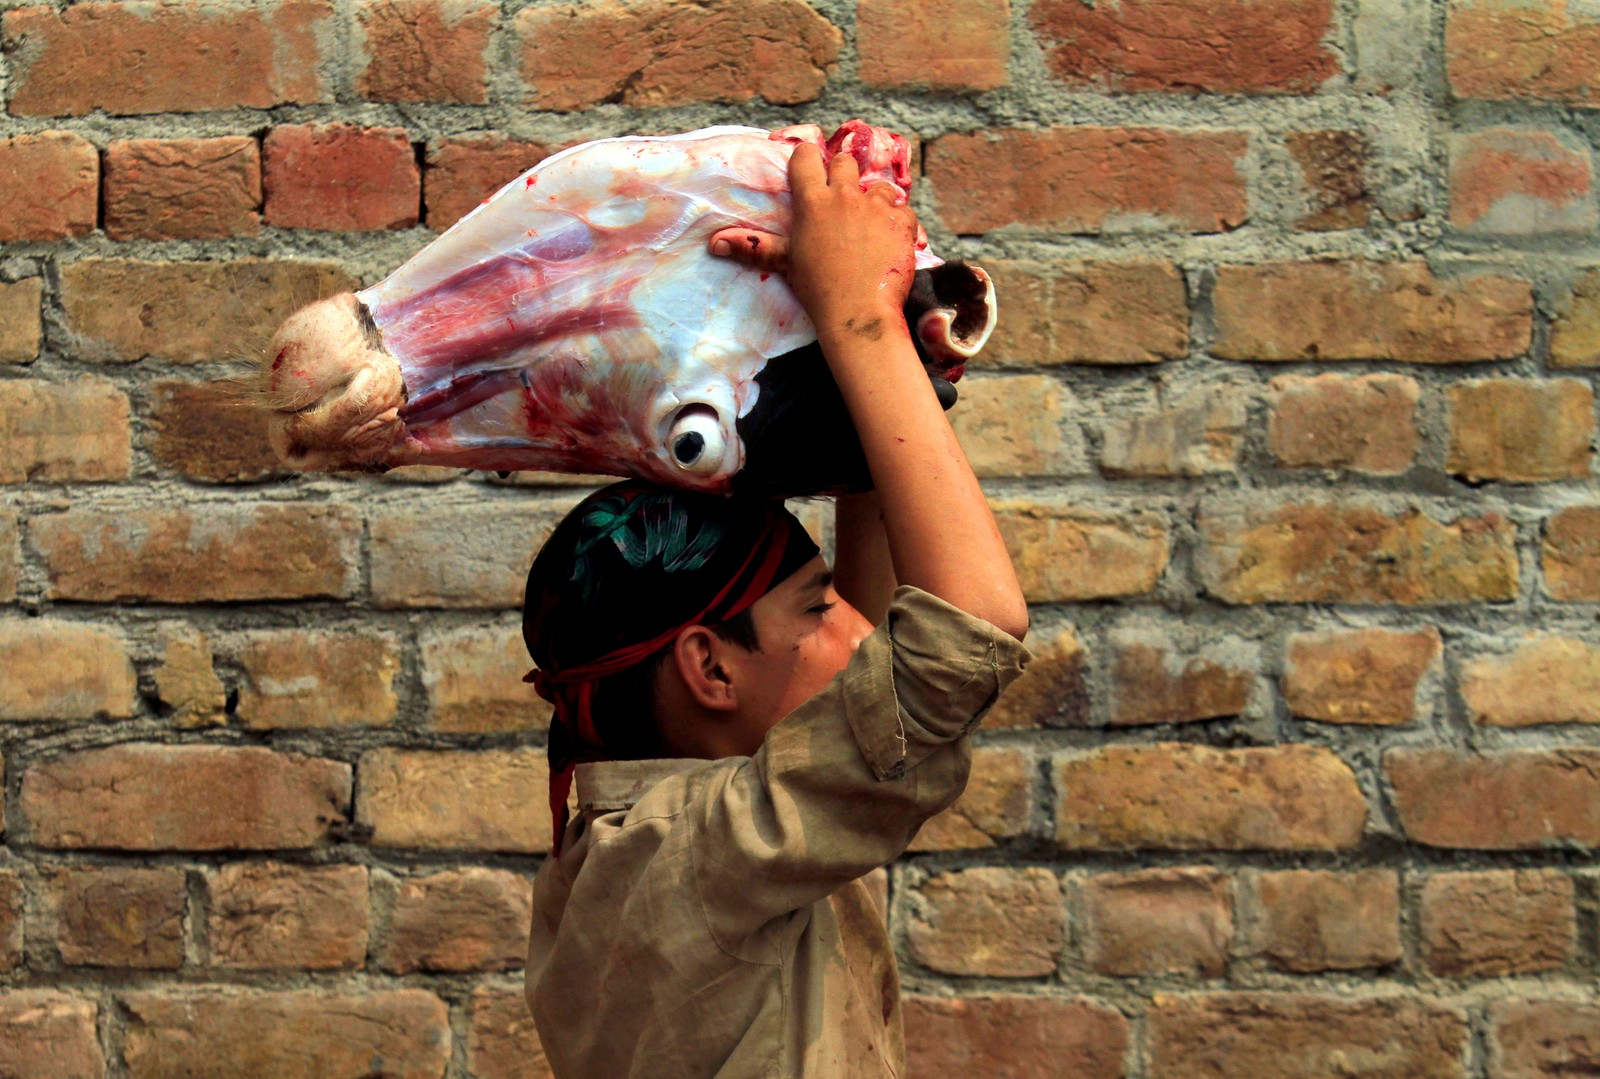 Kuhodefrakting på et slakteri i Peshawar i Pakistan.